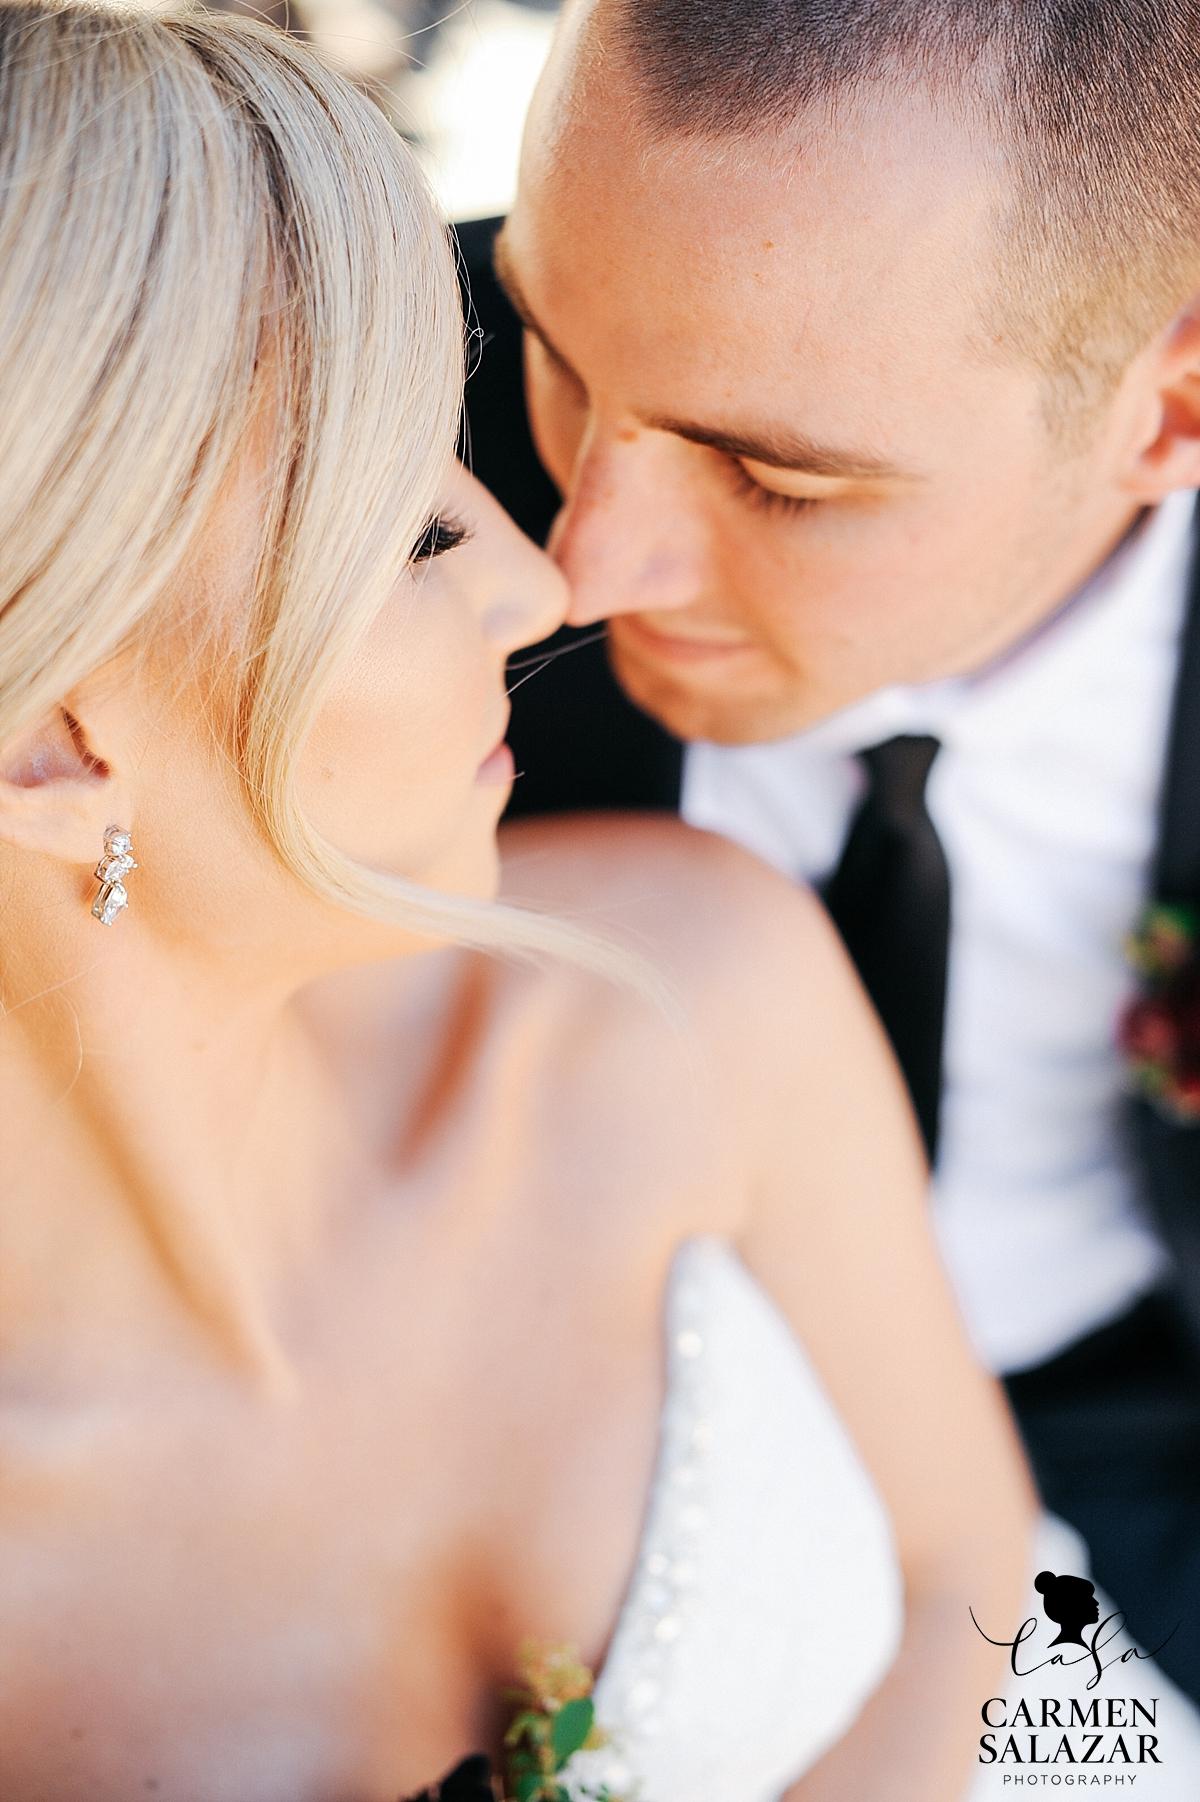 Sentimental and sweet wedding photography - Carmen Salazar